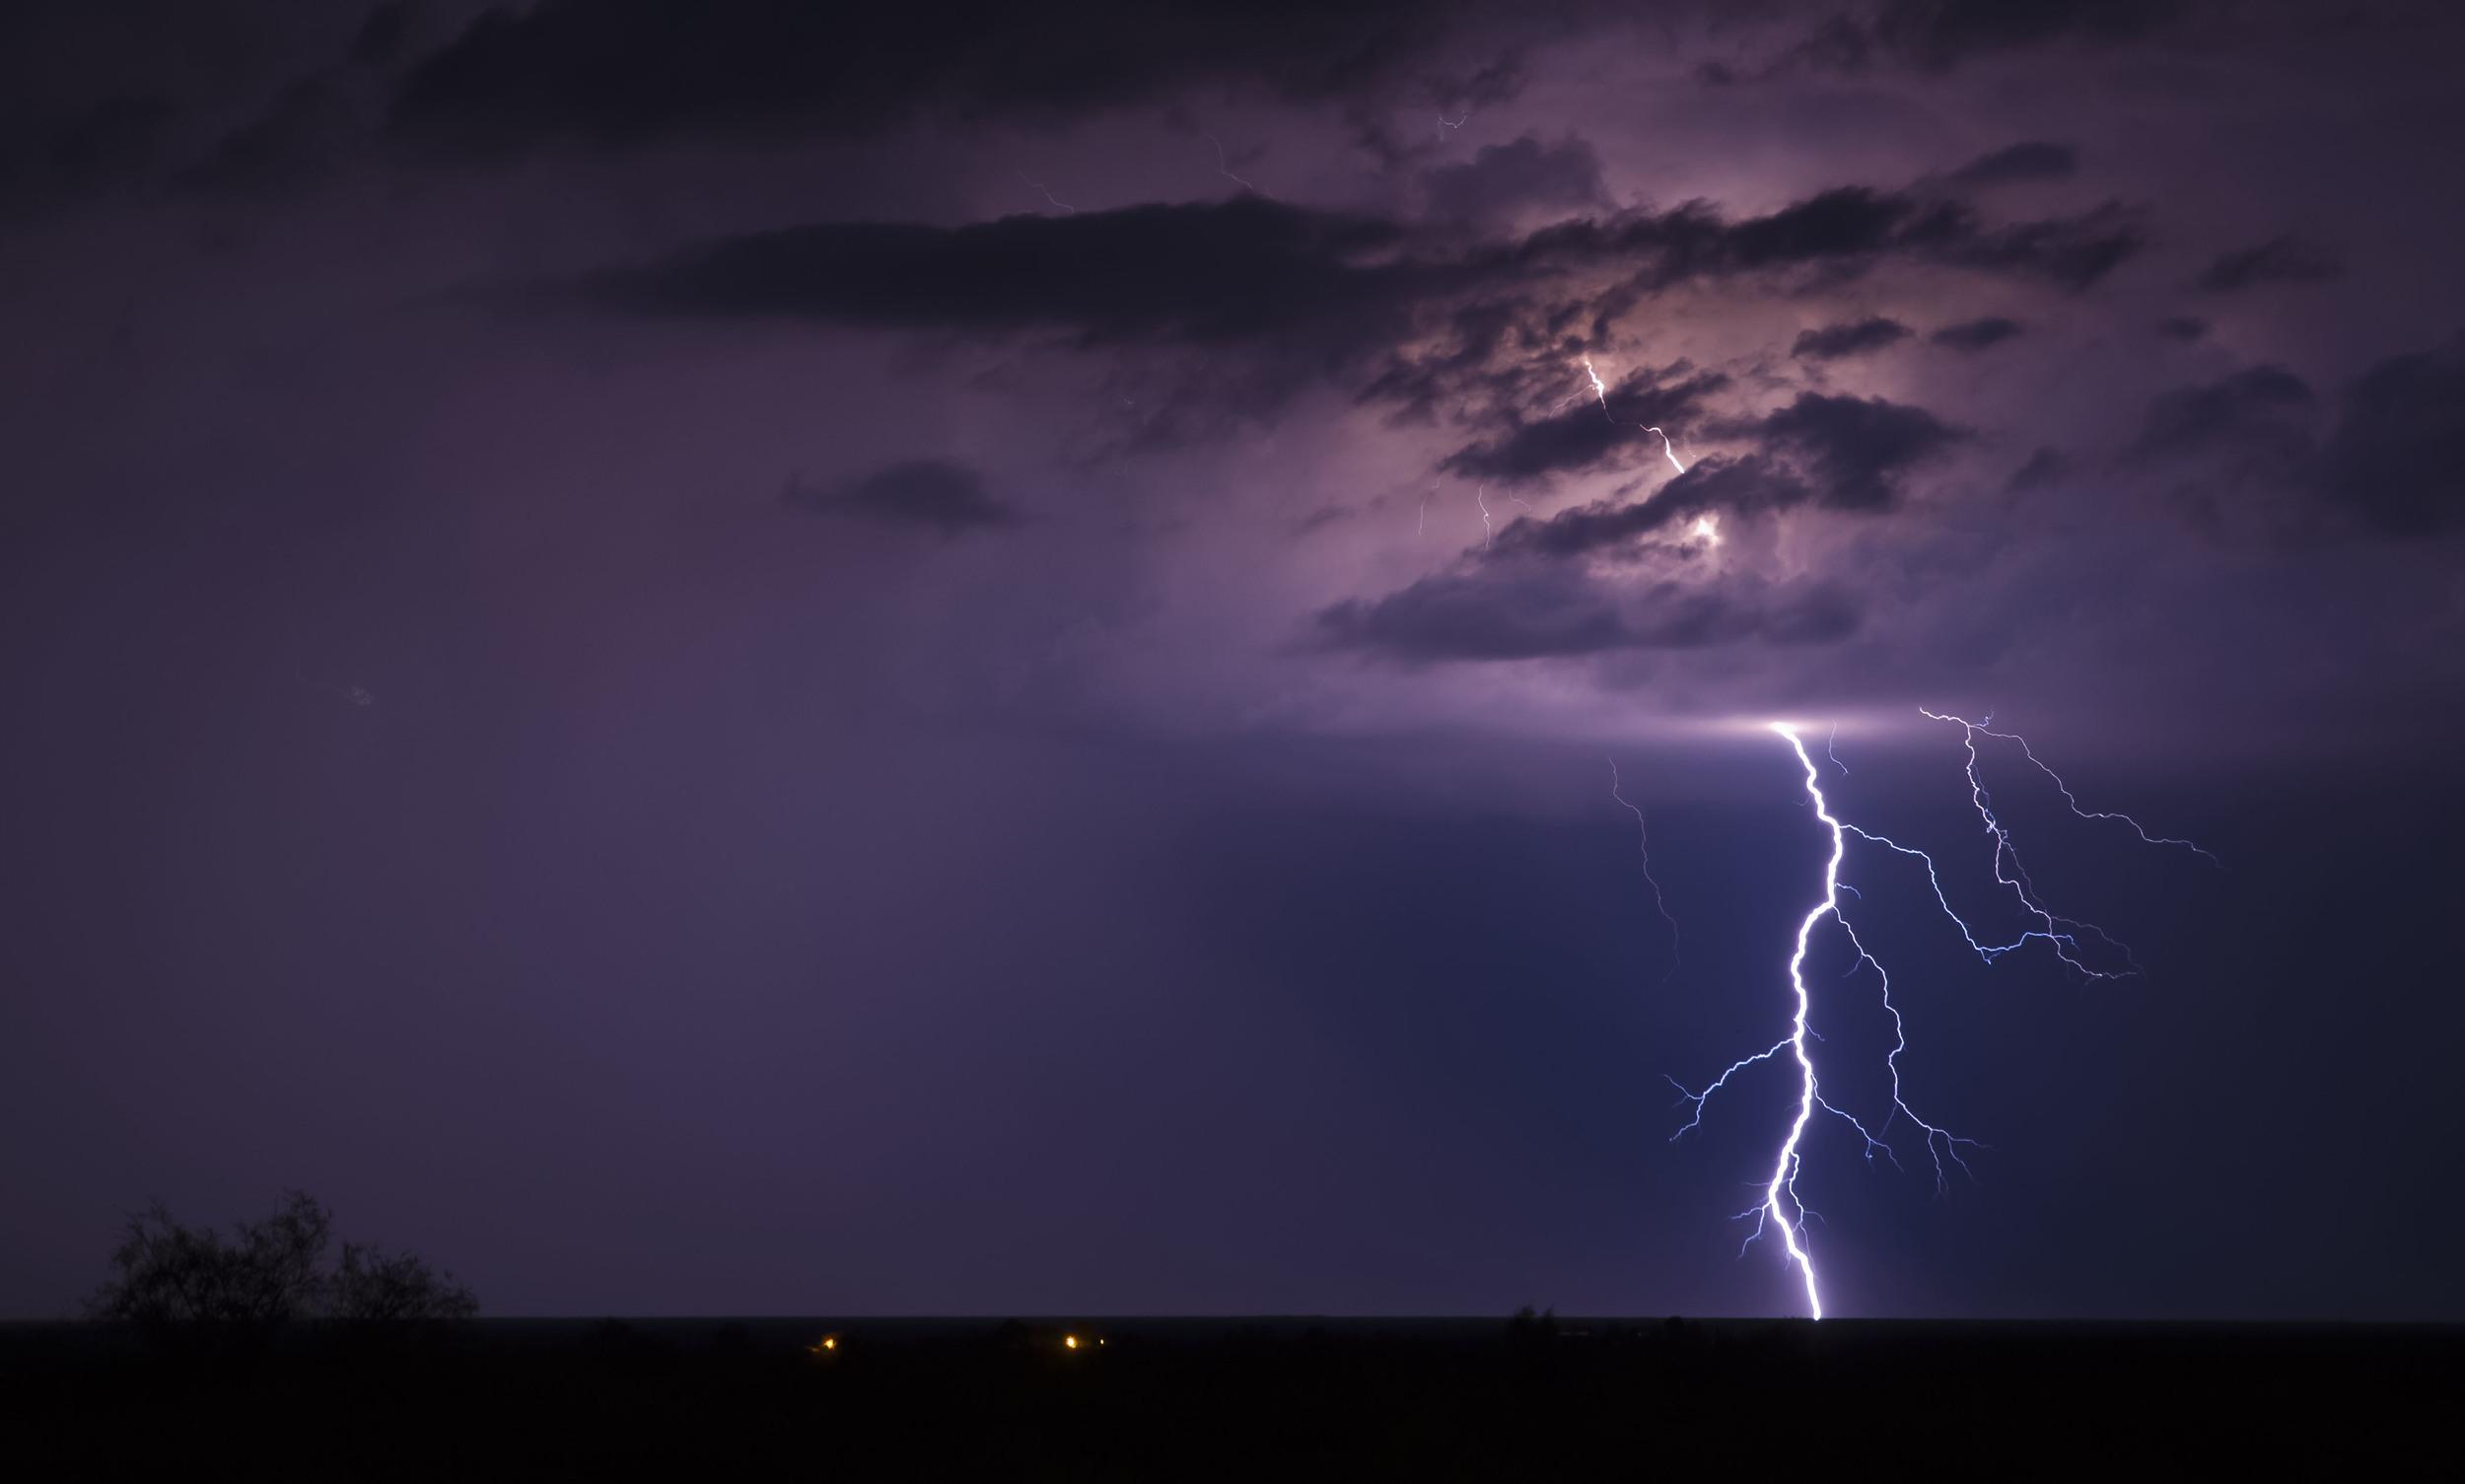 arizona-2012-195404.jpg